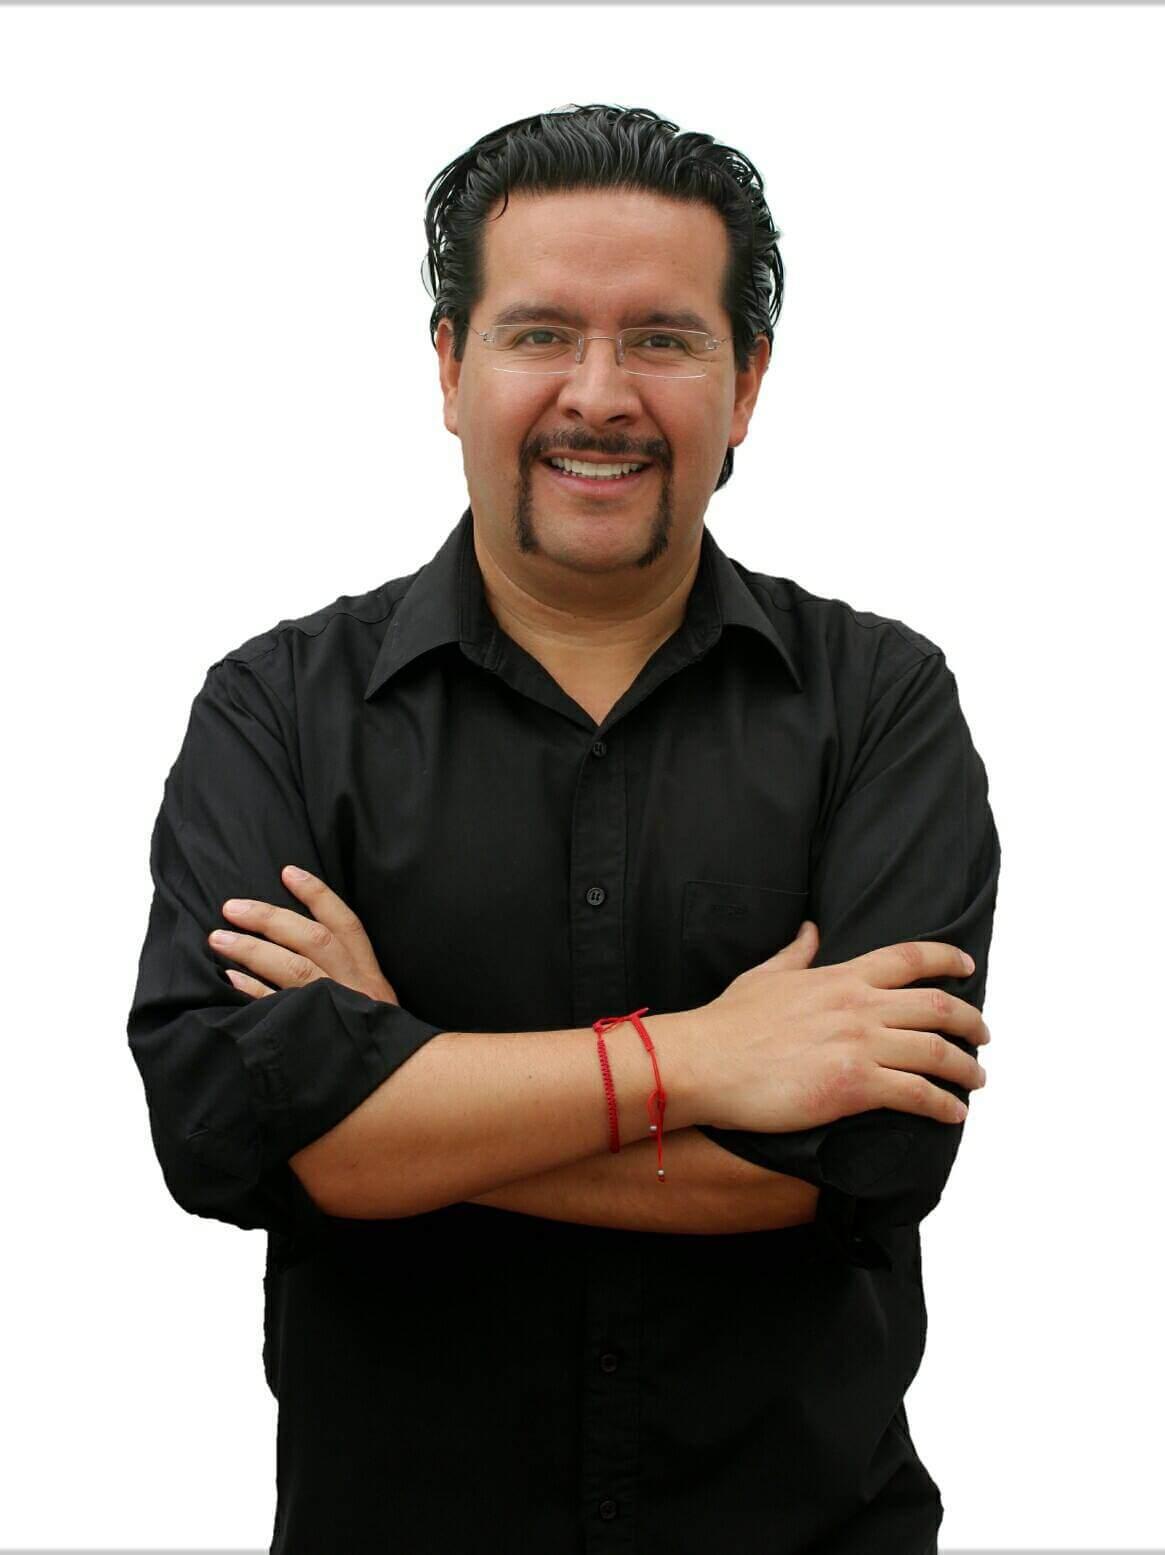 Miguel F Favila